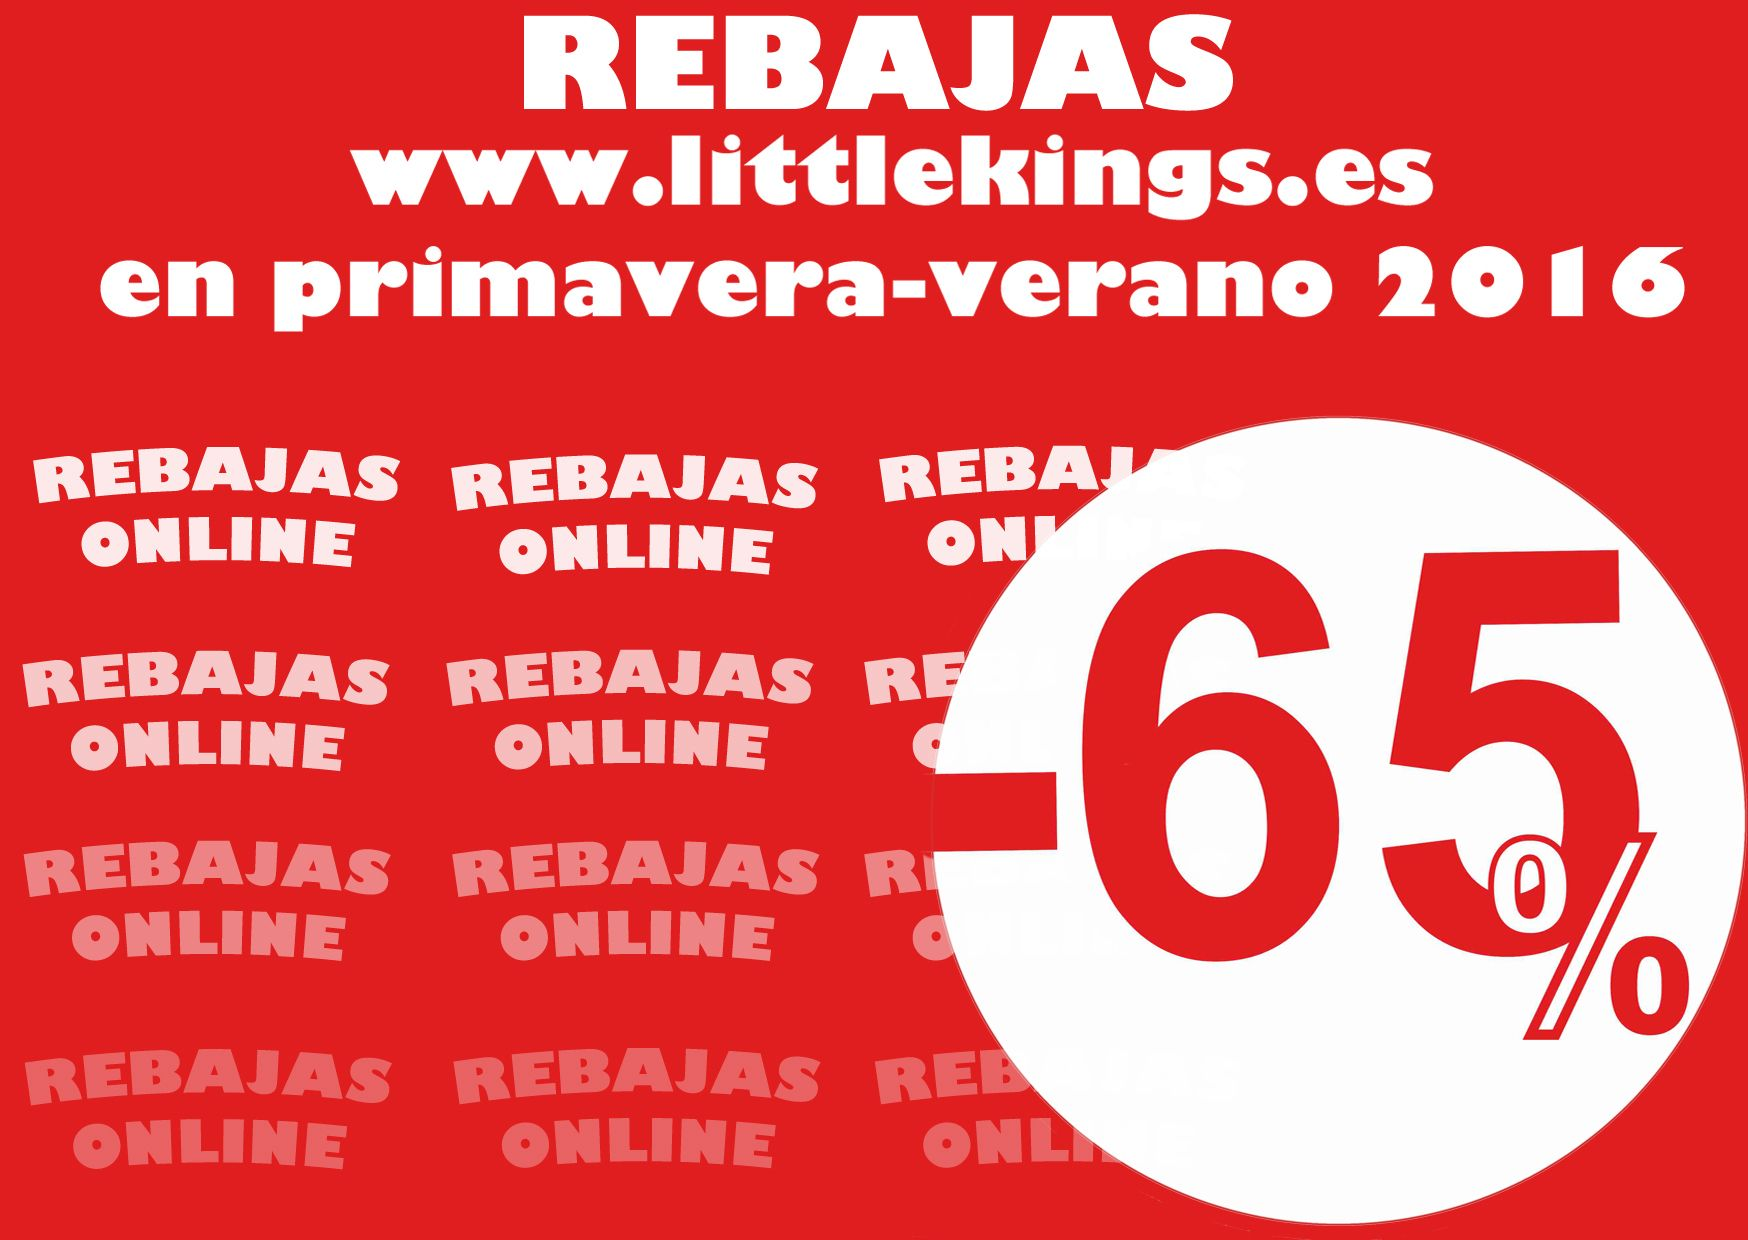 Hoy en nuestra web http://www.littlekings.es/tiendaonline